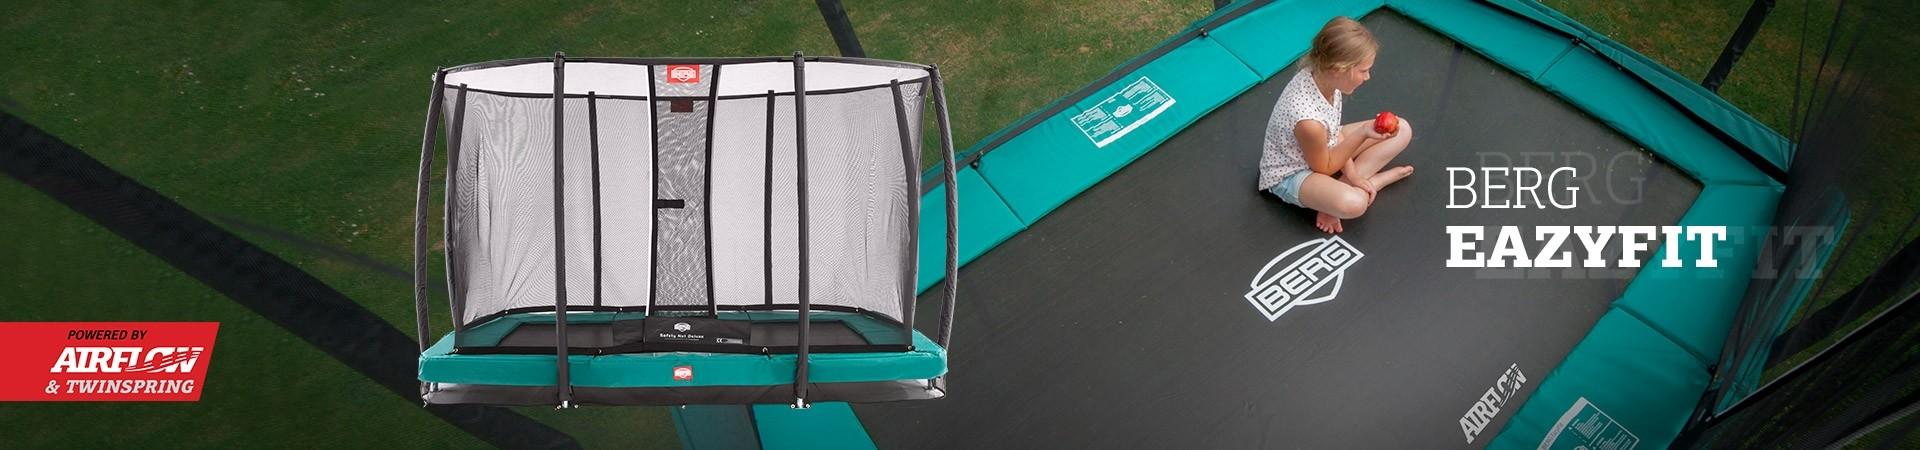 Berg Eazyfit trampoline